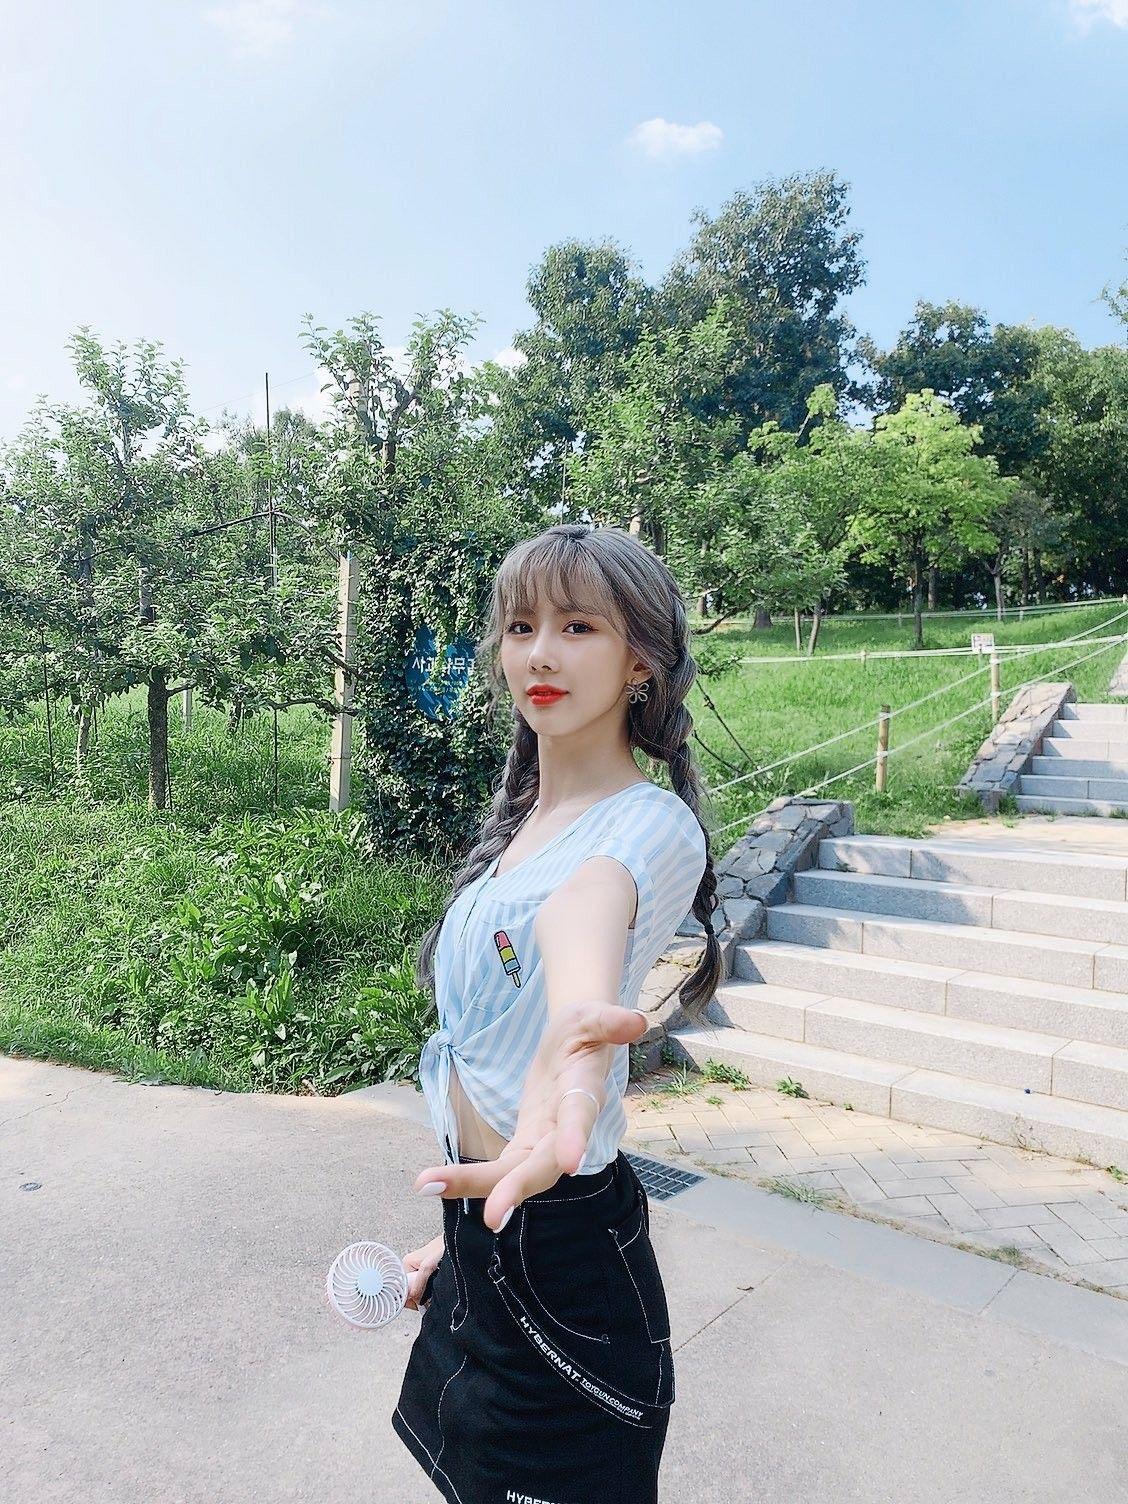 Yoohyeon S 2002 Cover In 2020 Dream Catcher Kpop Girls My Girl